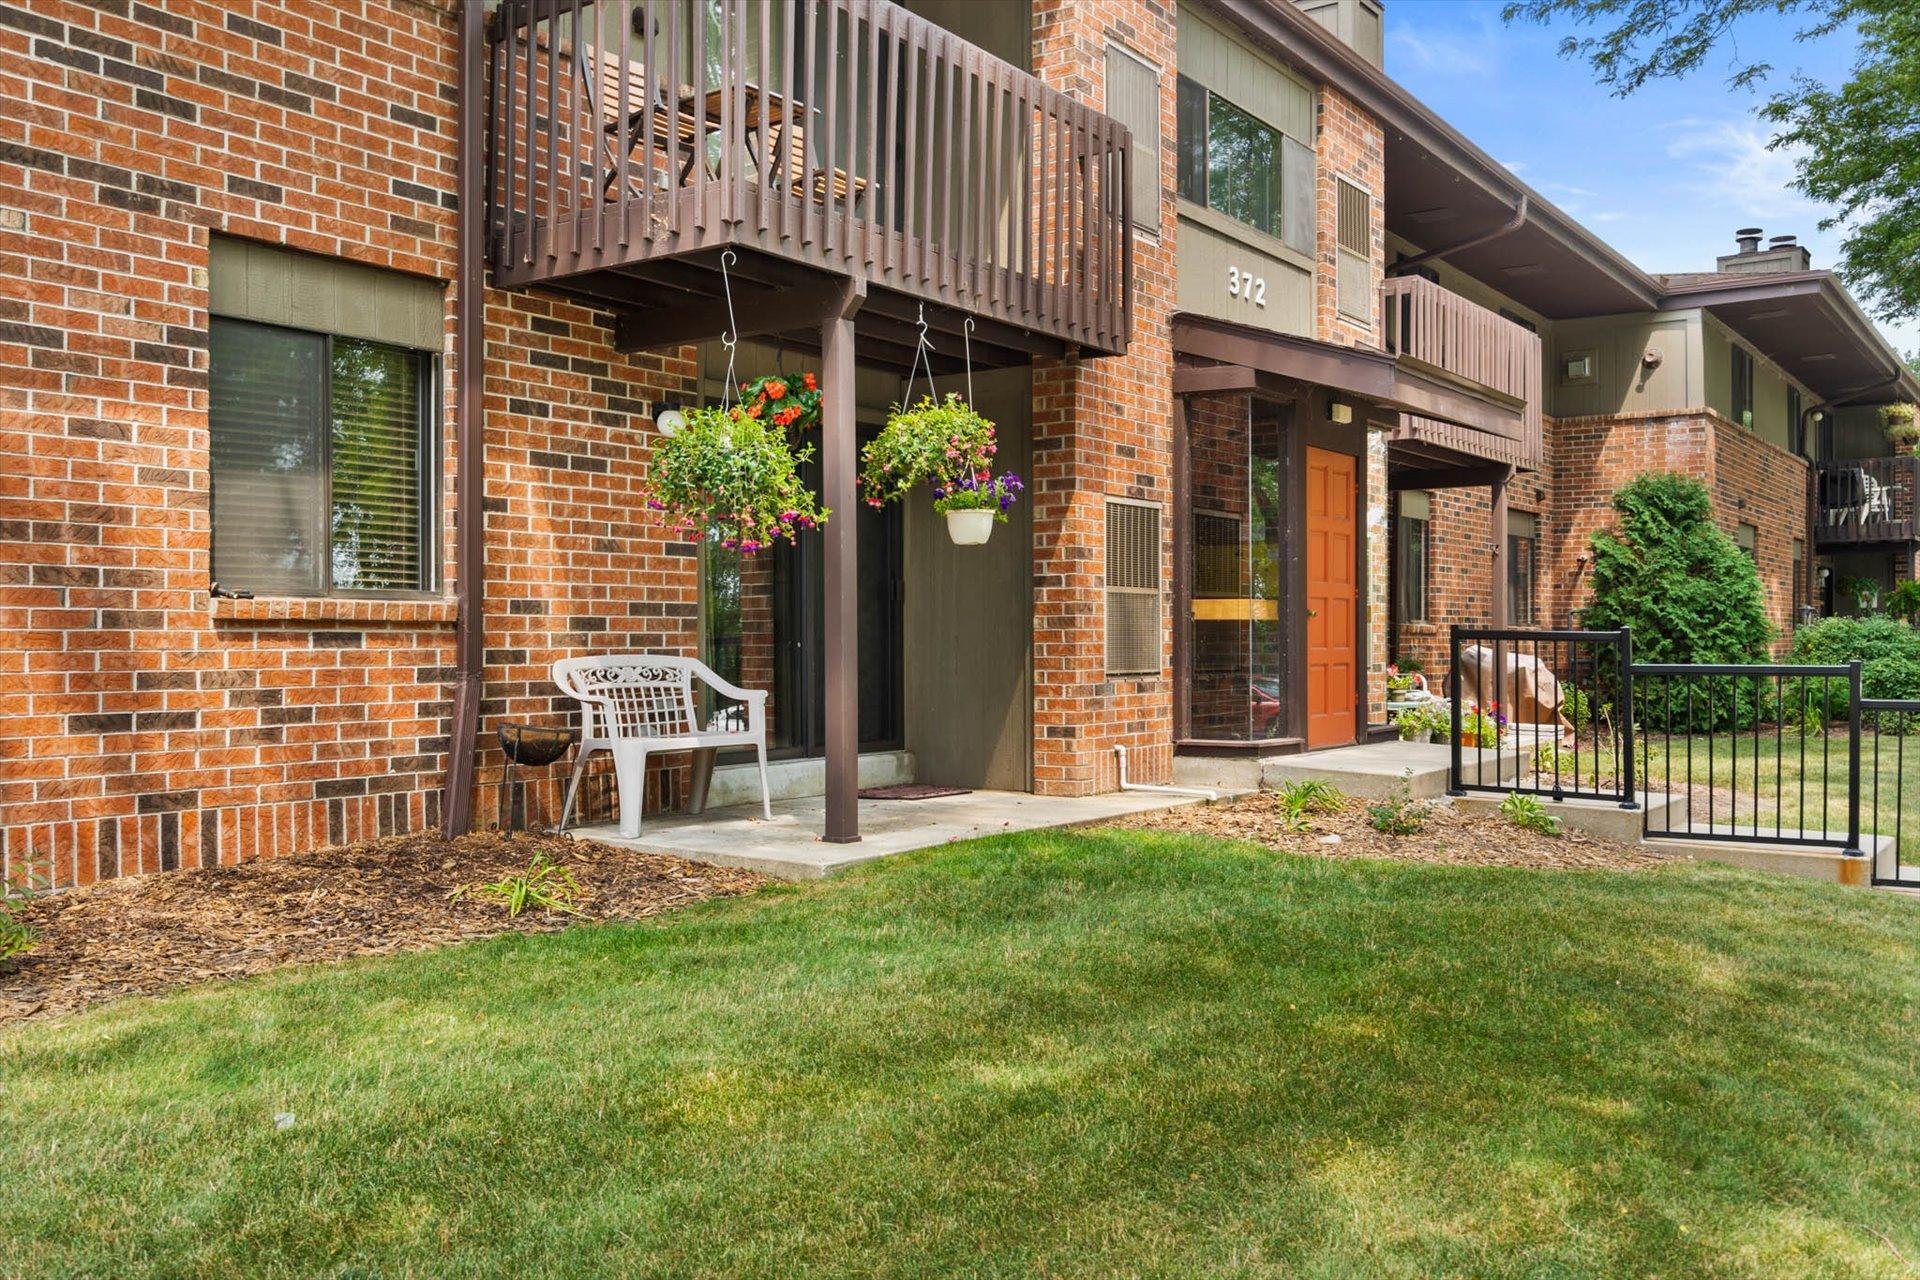 372 Park Hill Dr, Pewaukee, Wisconsin 53072, 2 Bedrooms Bedrooms, 6 Rooms Rooms,2 BathroomsBathrooms,Condominiums,For Sale,Park Hill Dr,1,1755163